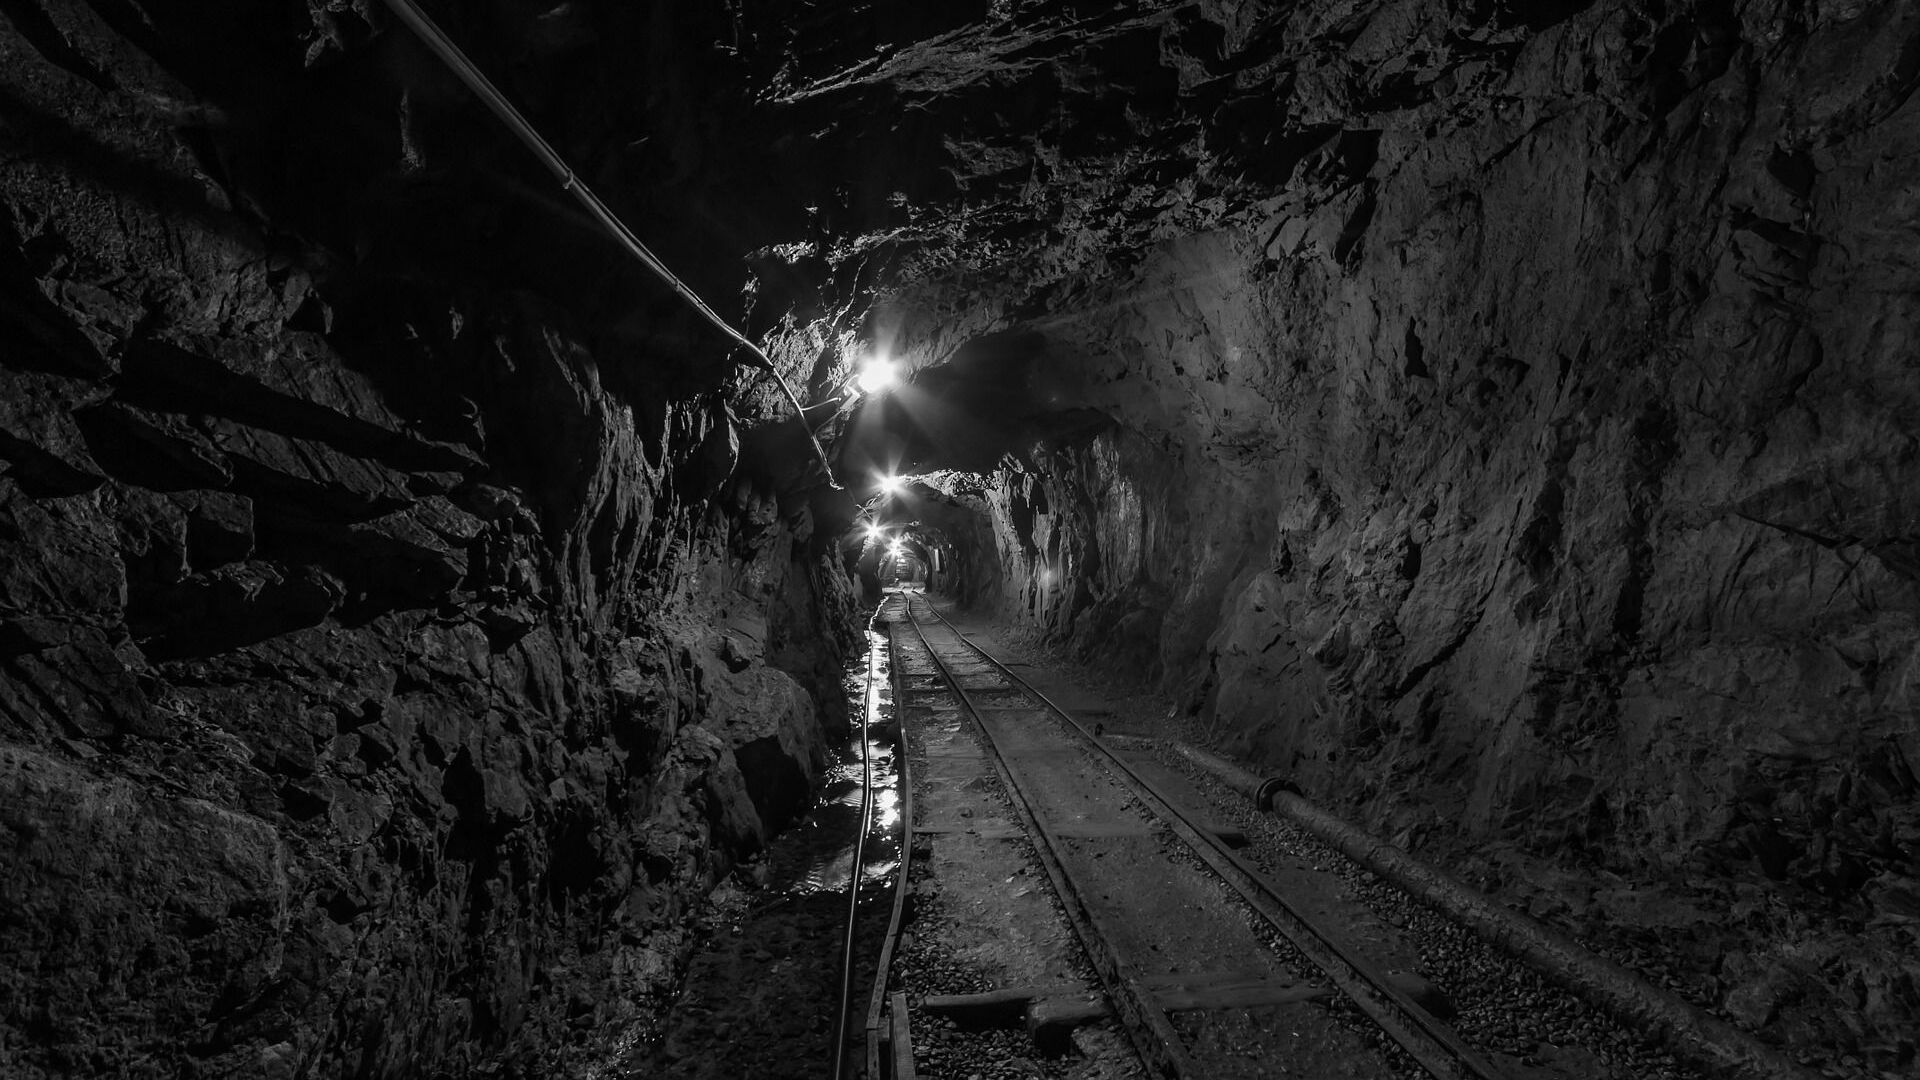 Un túnel en una mina - Sputnik Mundo, 1920, 11.04.2021